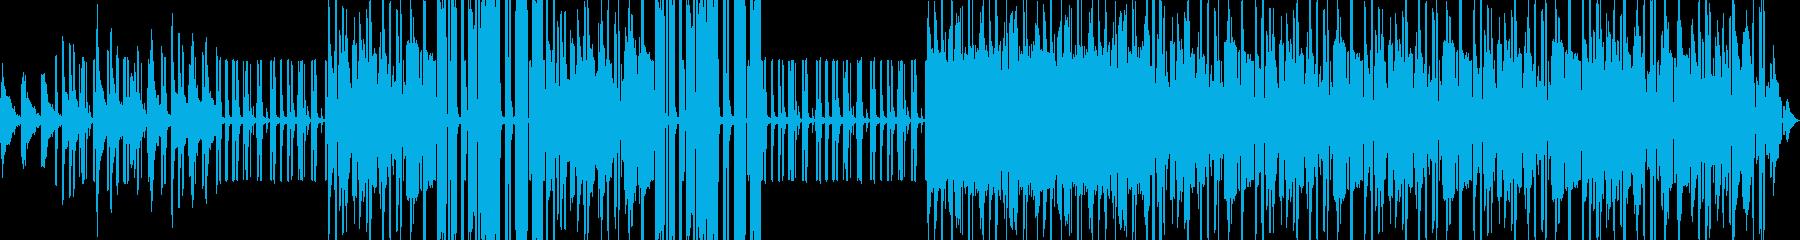 Mac風オープニングおしゃれBGM60秒の再生済みの波形